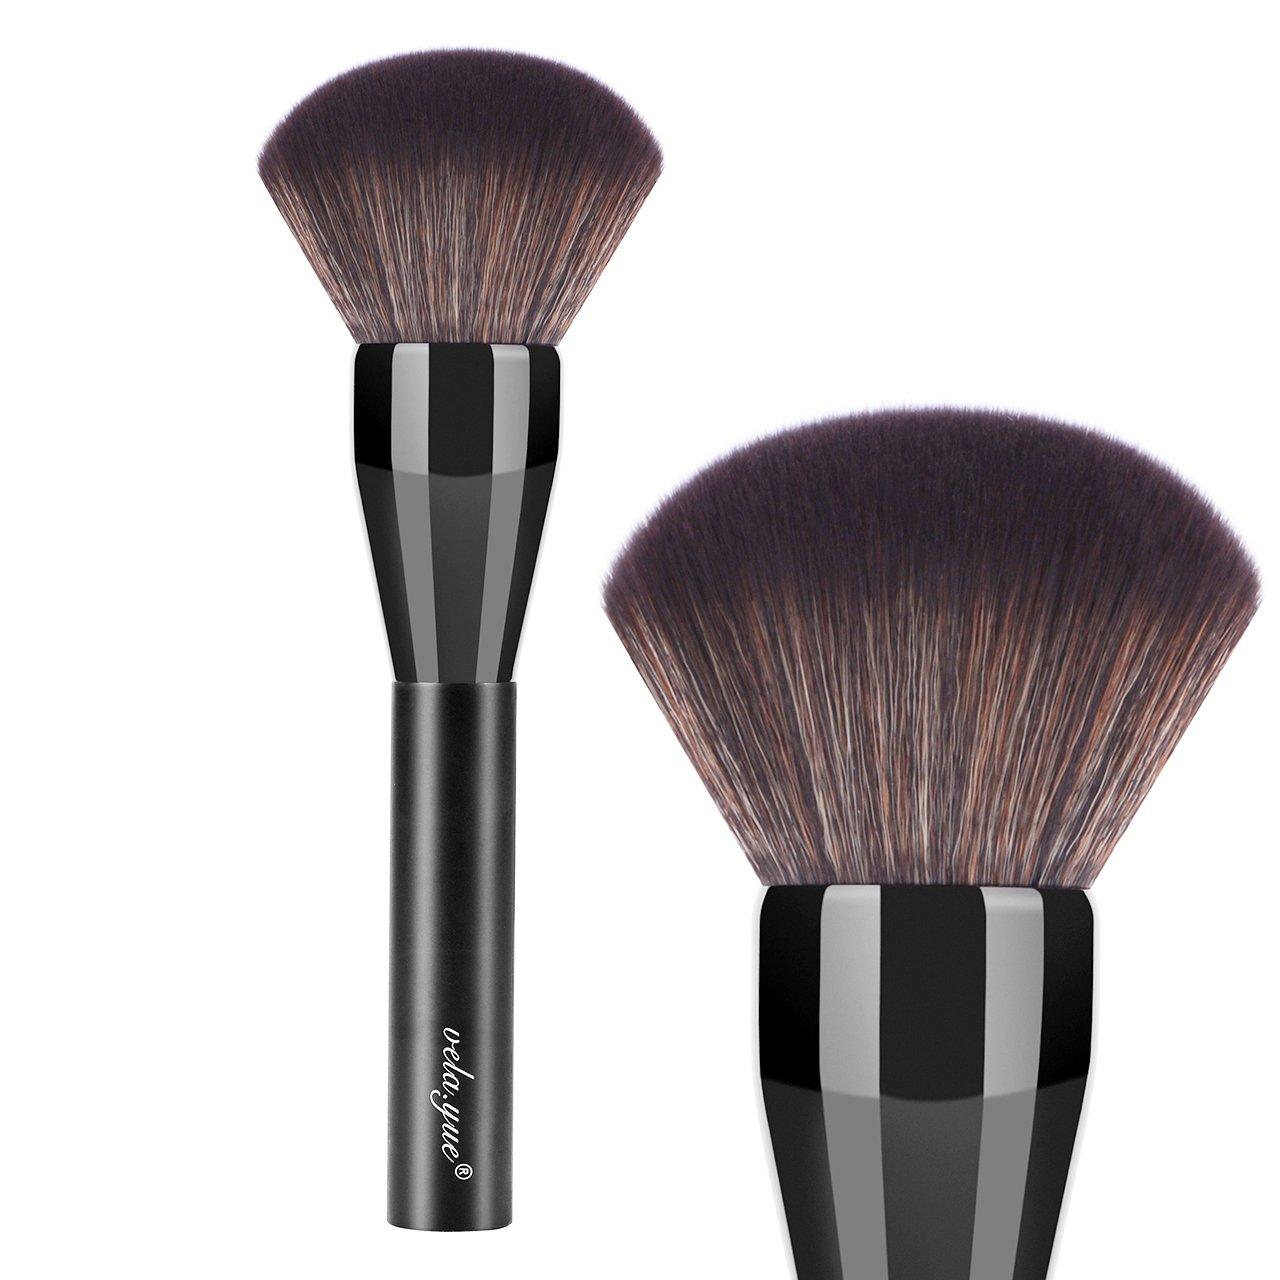 vela.yue Super Large Powder Brush Soft Fluffy Face Loose Mineral Foundation Makeup Brush